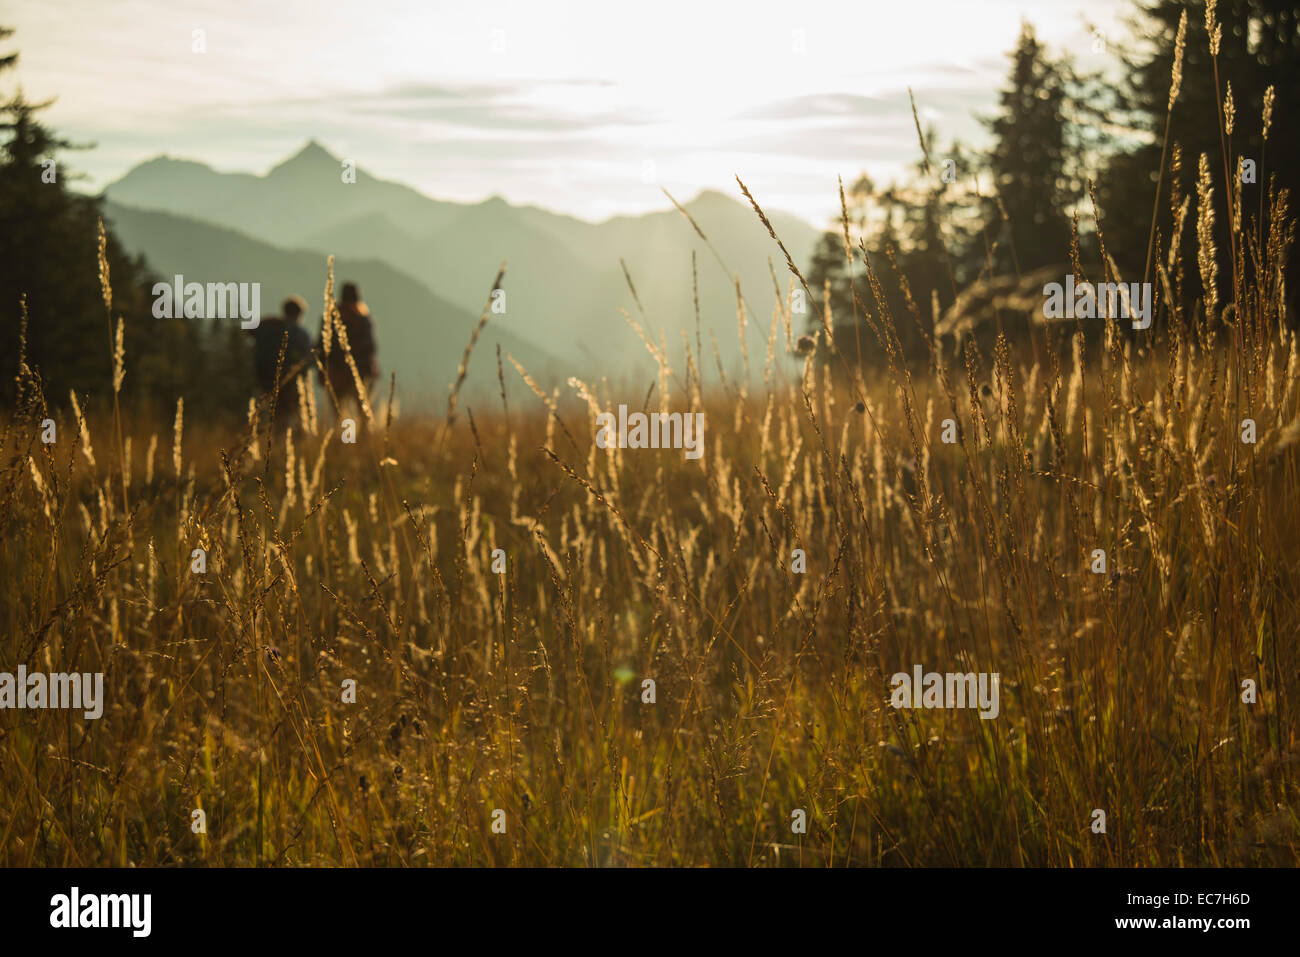 Austria, Tyrol, Tannheimer Tal, tall grass in sunlight on alpine meadow - Stock Image